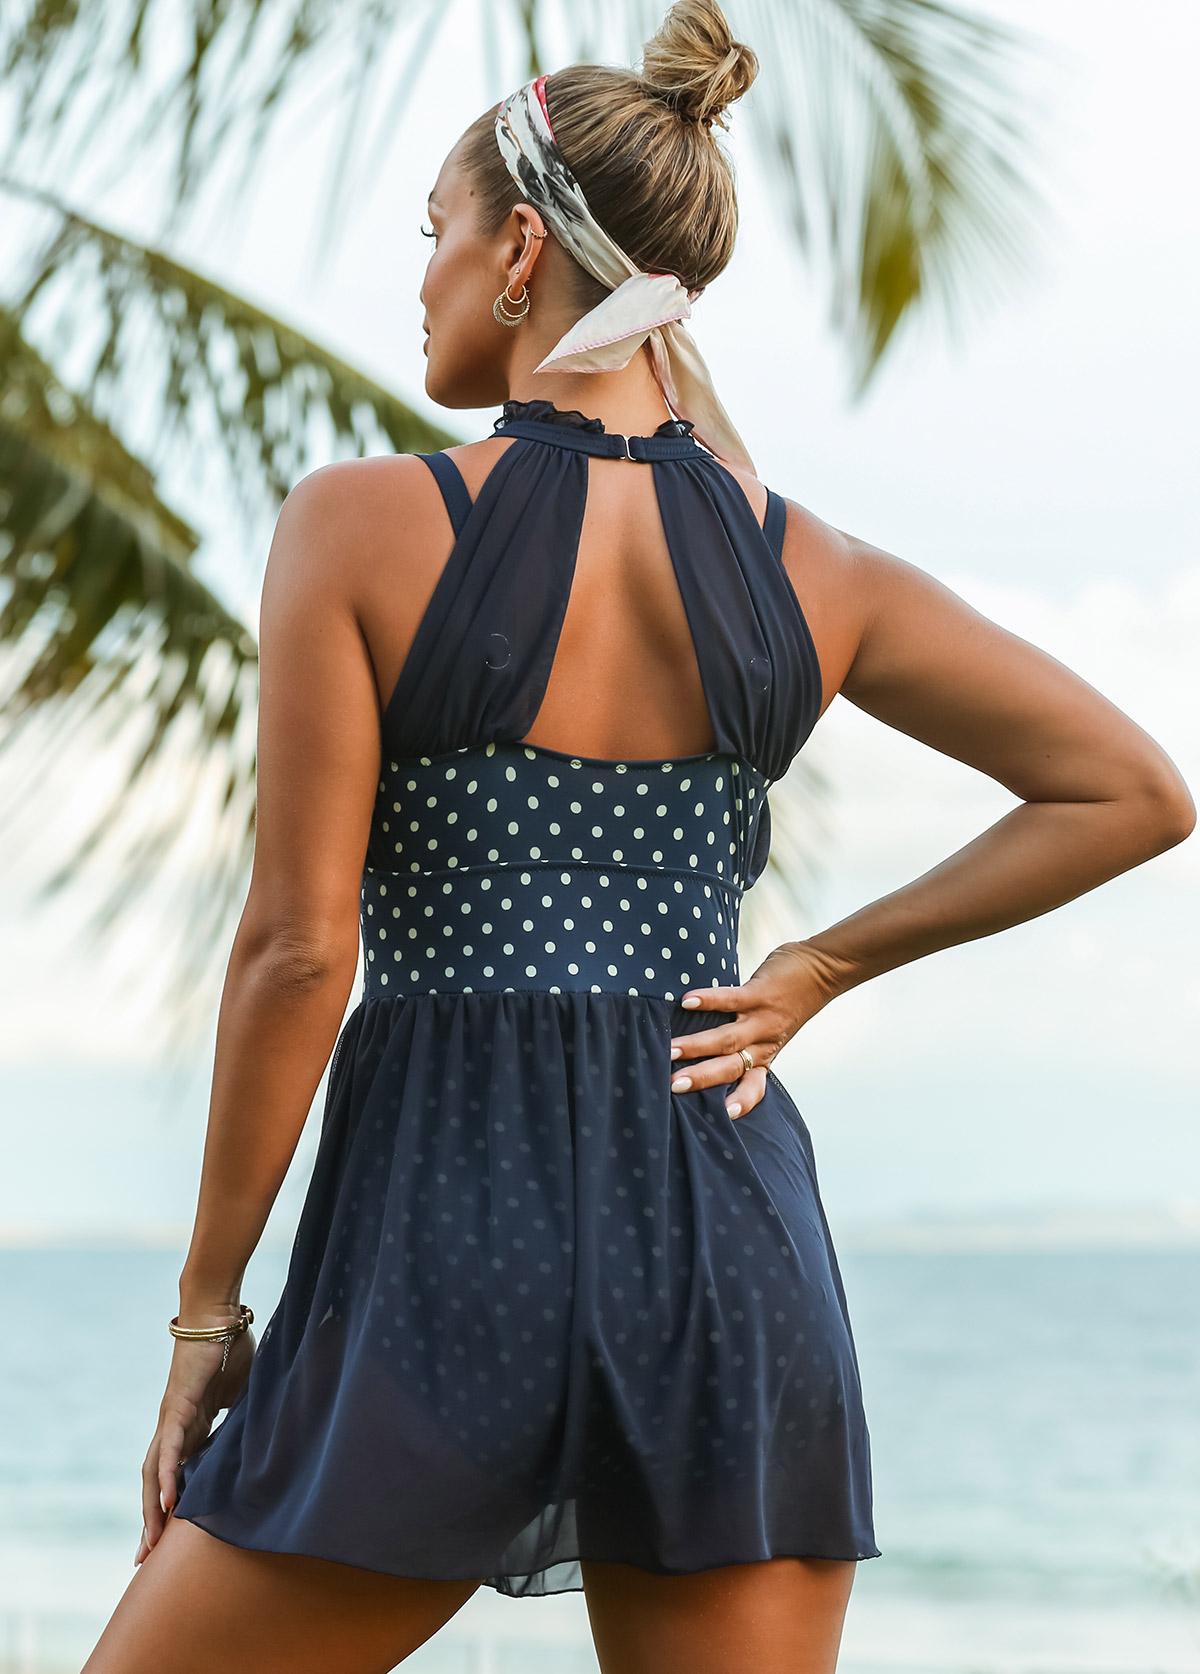 Polka Dot Cutout Back One Piece Swimwear